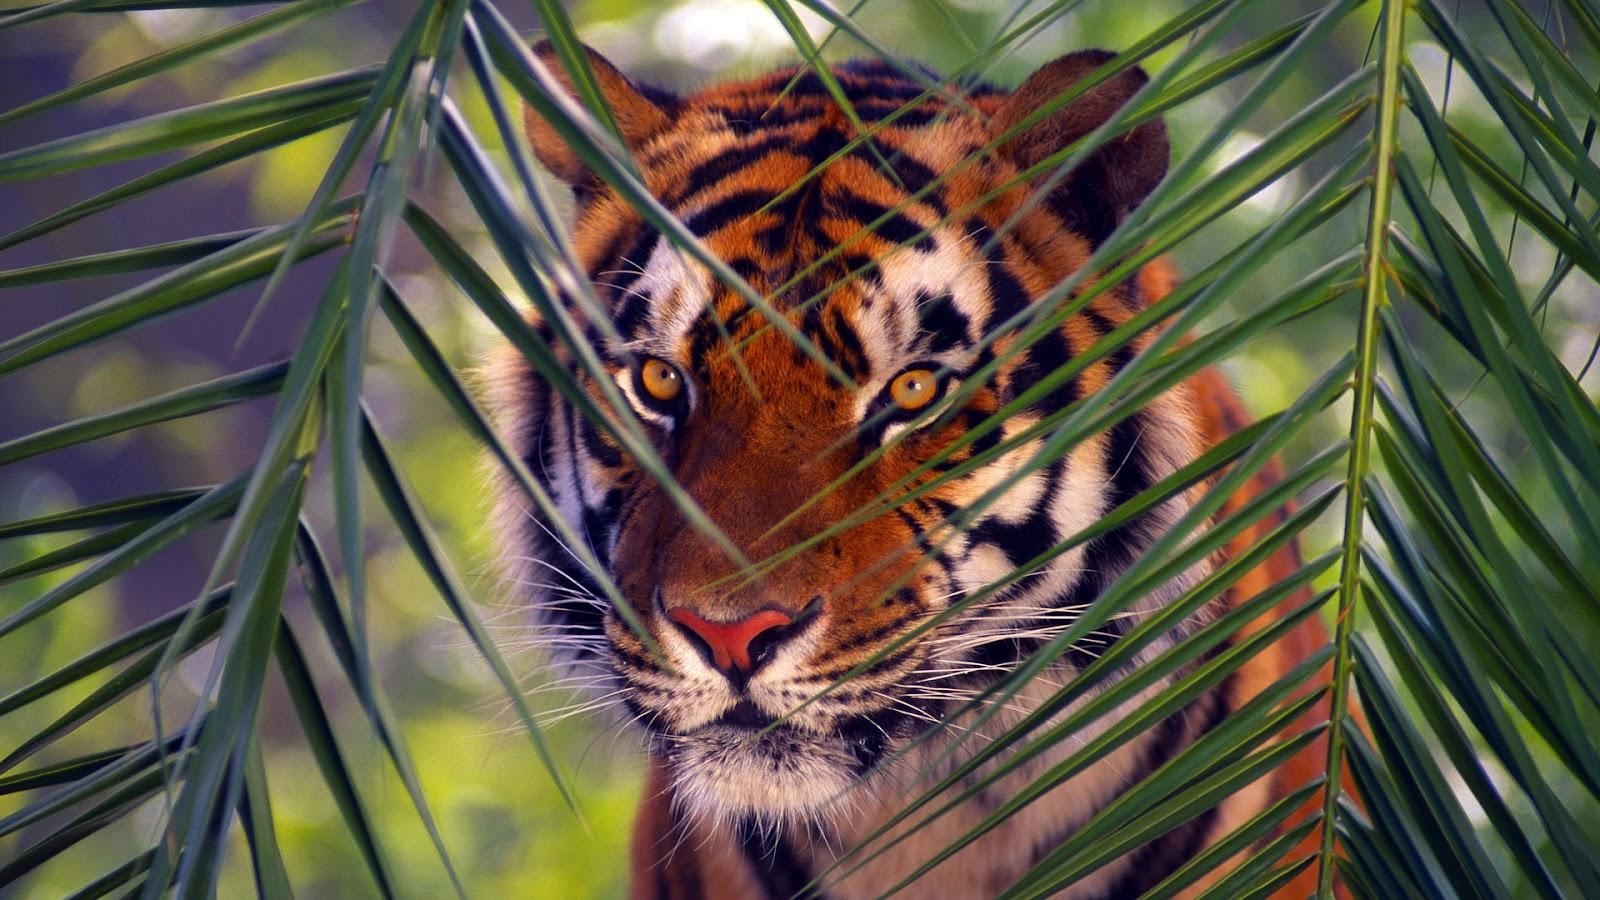 Cute tiger wallpaper Wallpaper Wide HD 1600x900